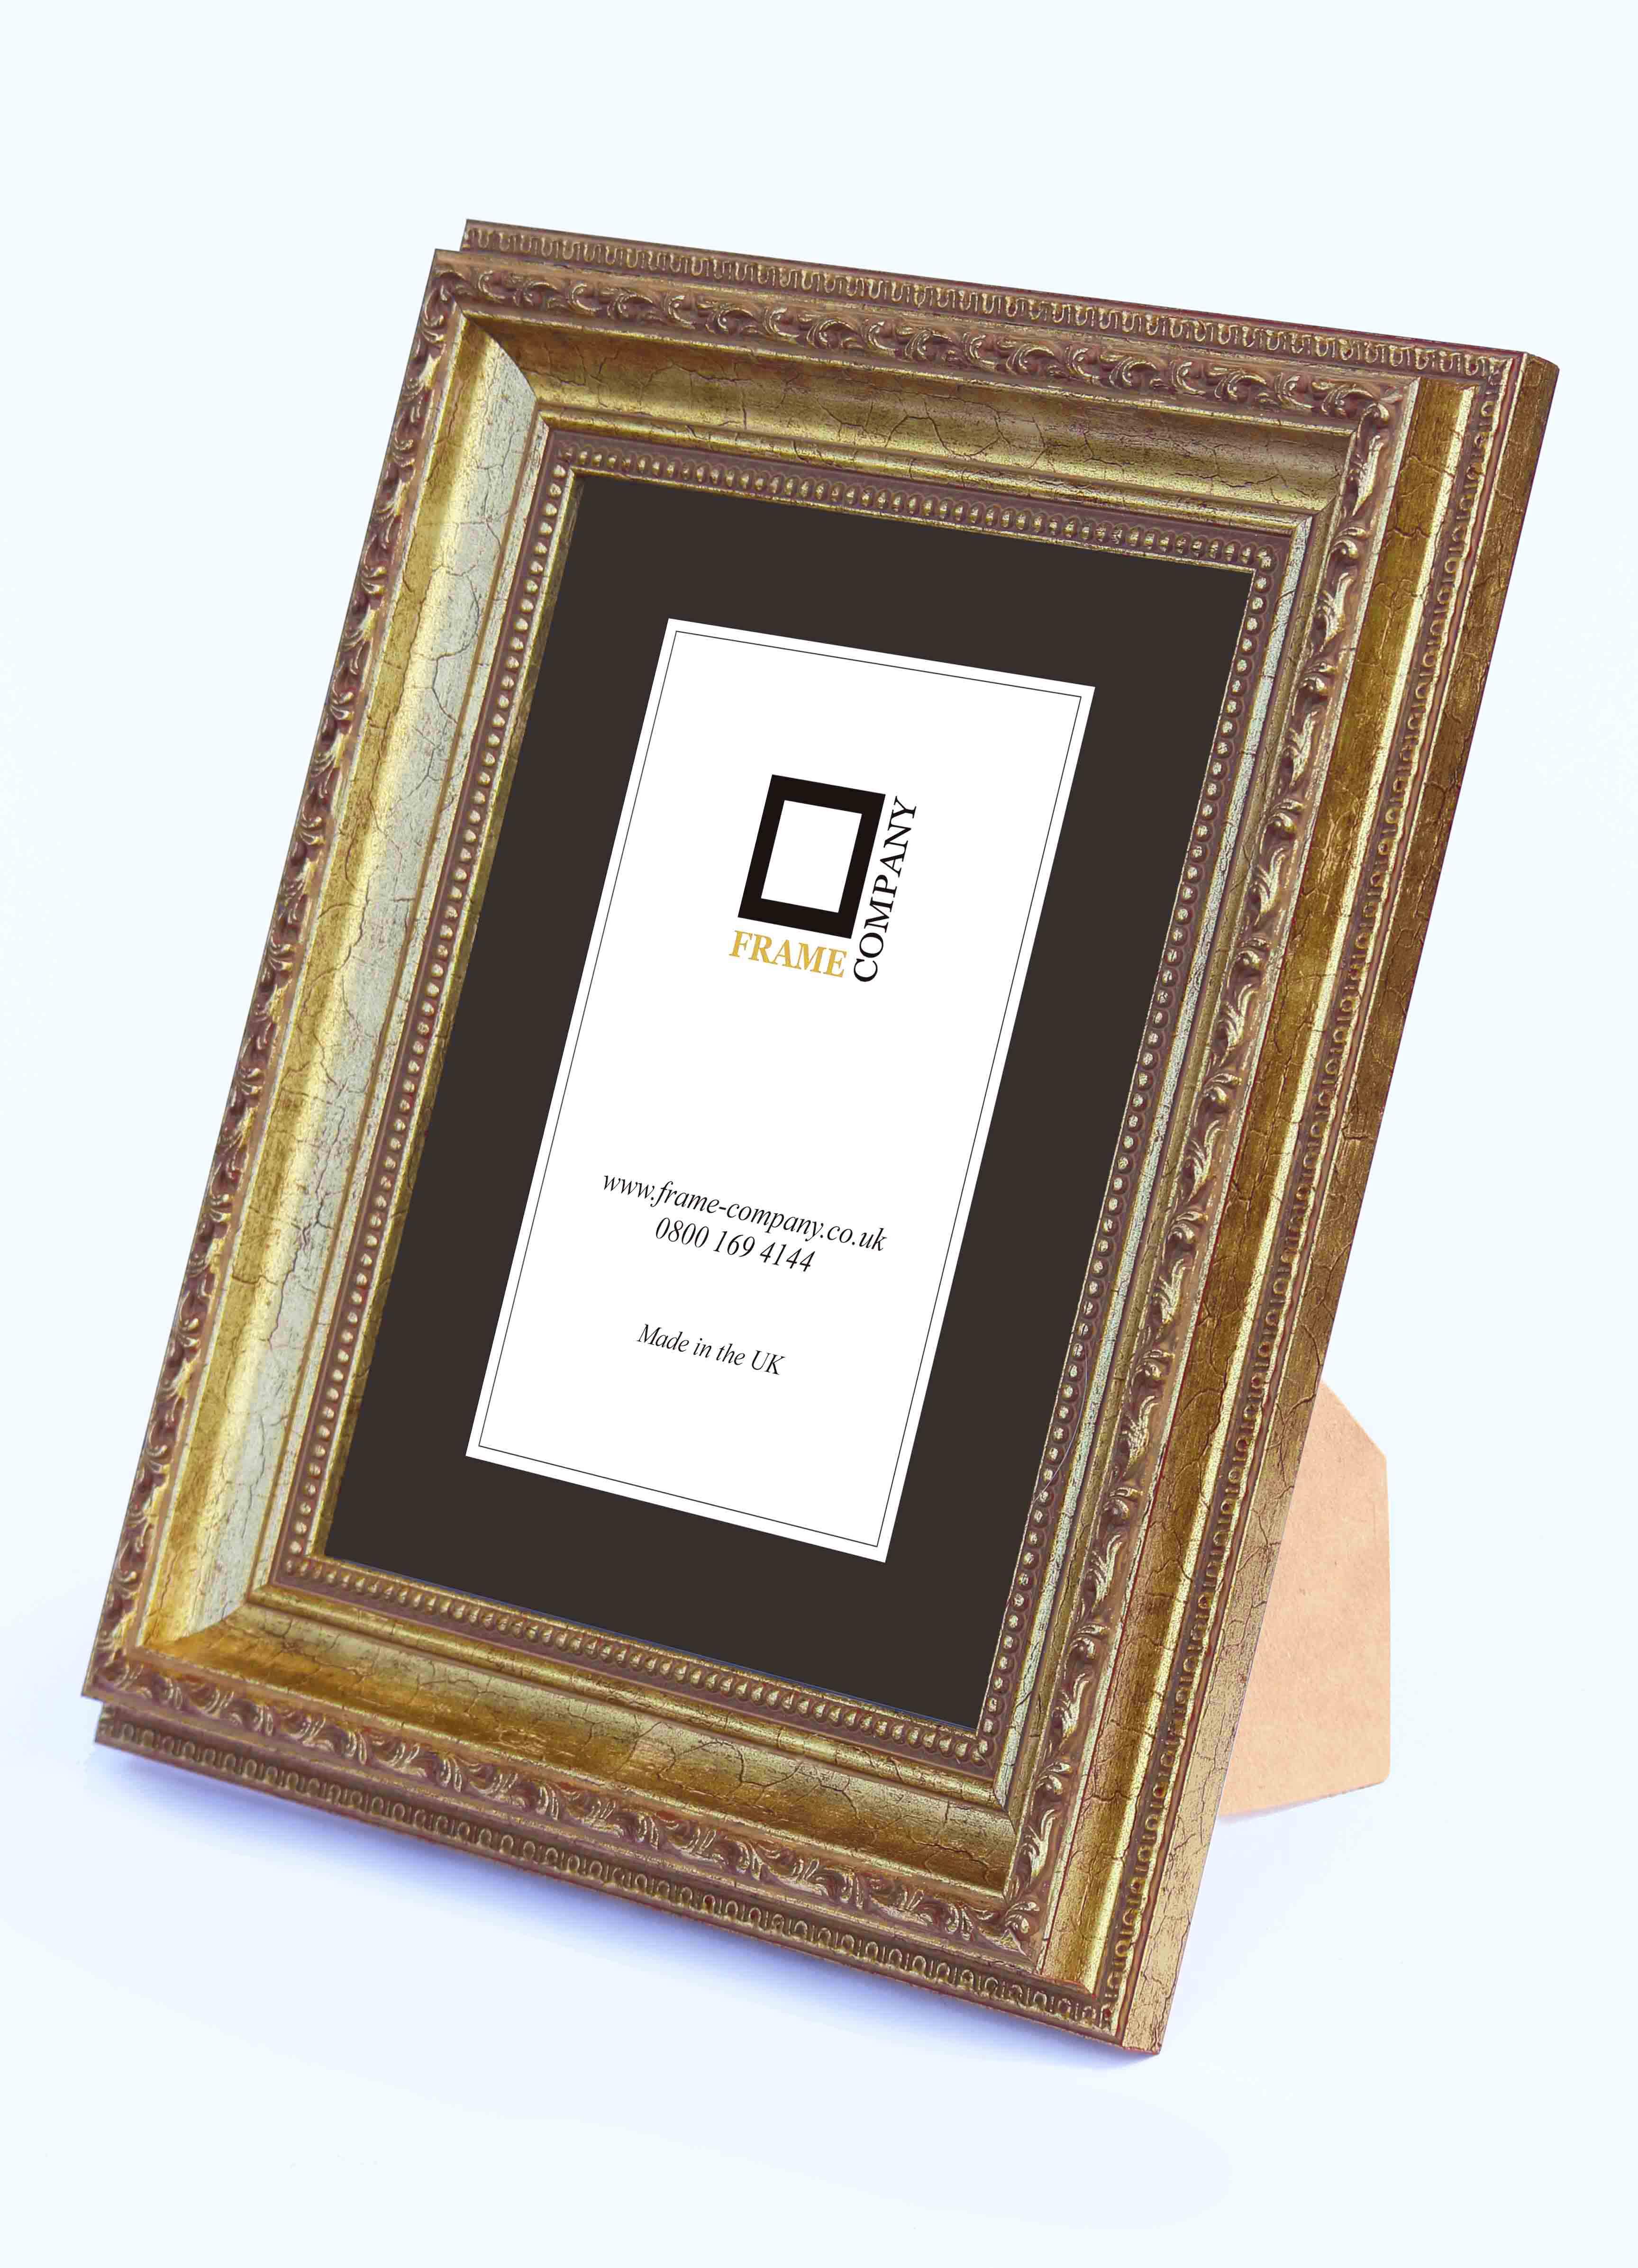 Frame Company Fiorelli GAMA madera barrido Adorno vintage imagen ...